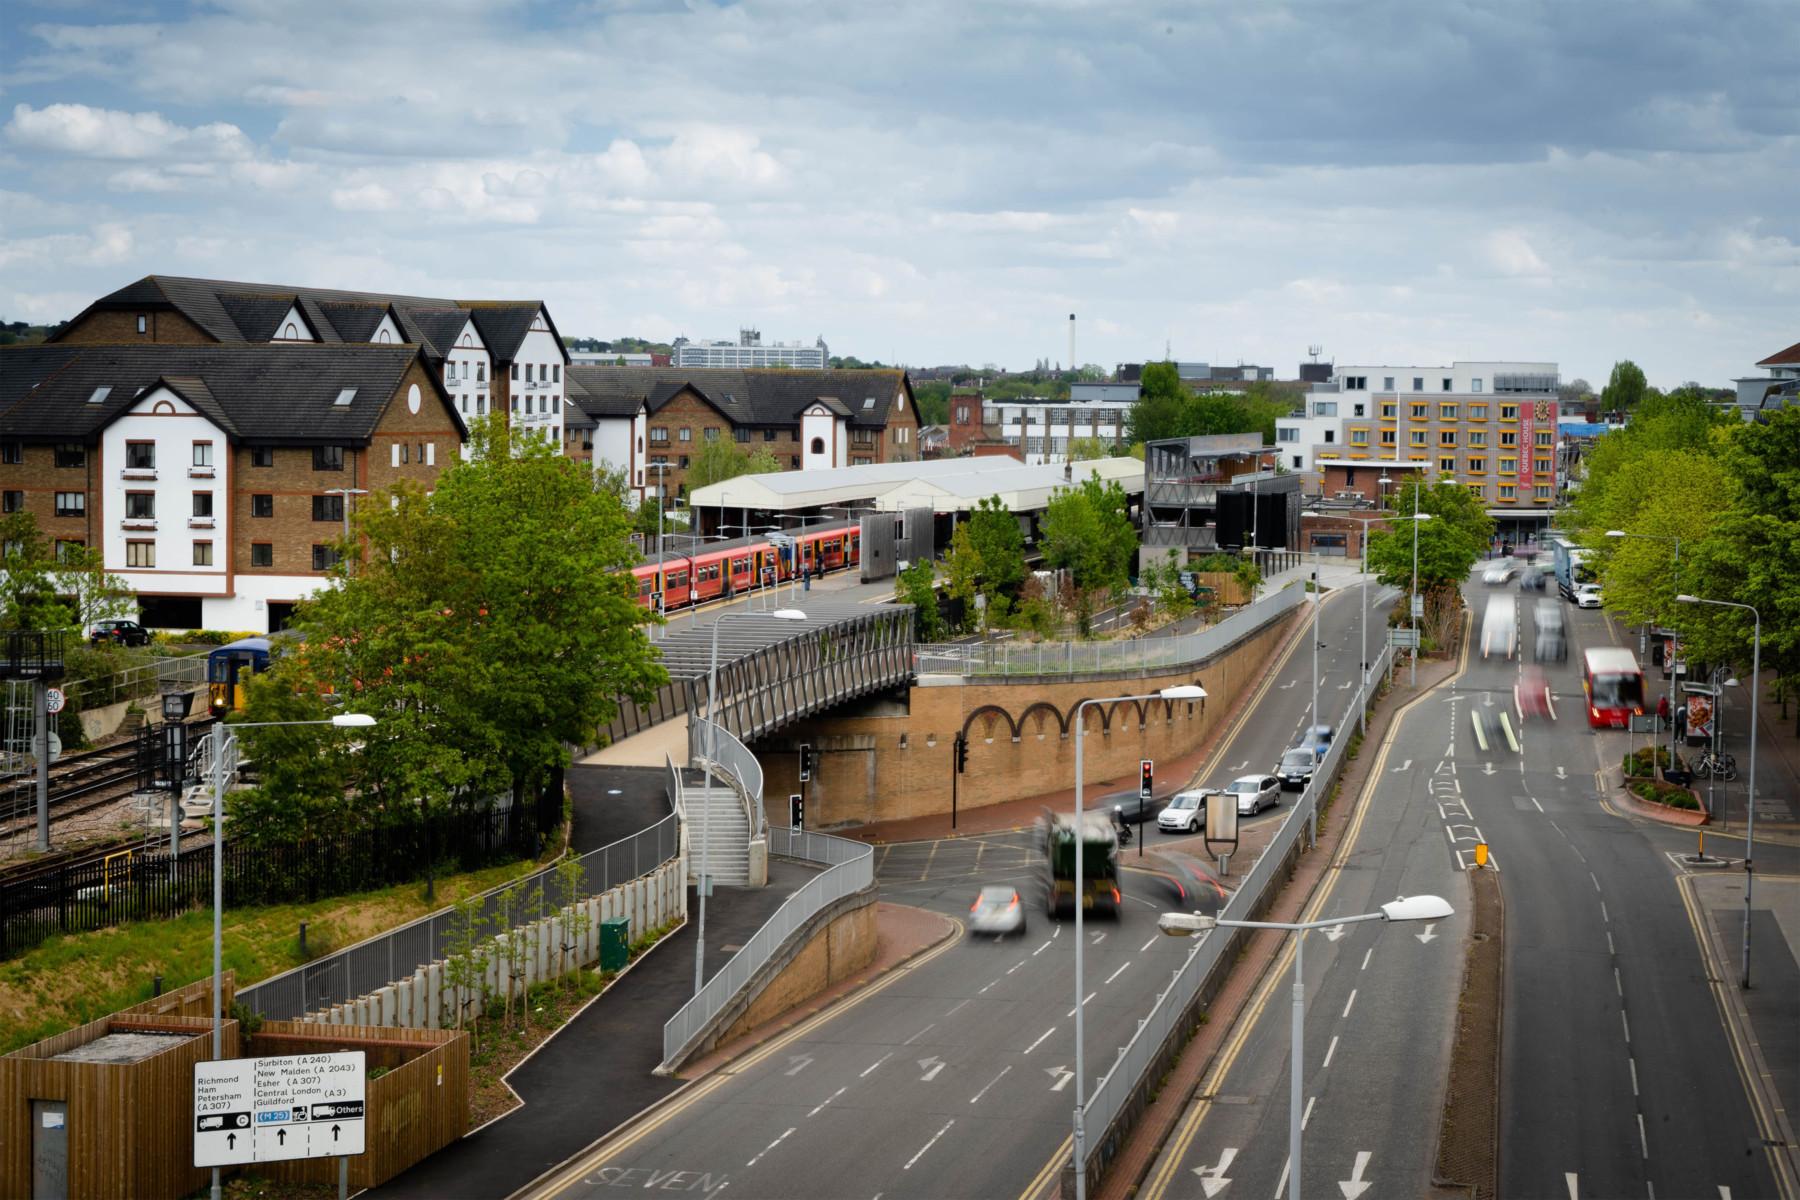 Sarah-Wigglesworth-Architects Kingston-Go-Cycle  Wide Angle  3600x2400